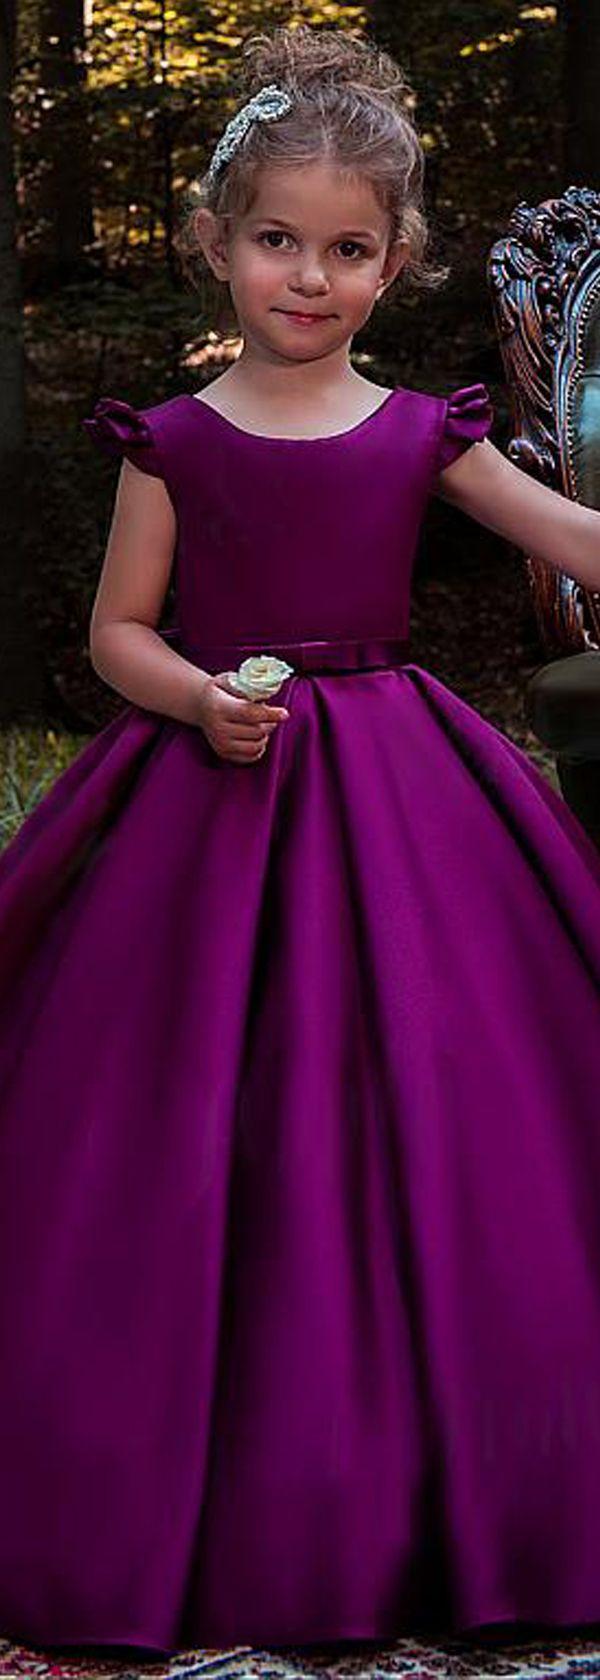 Sweet Satin Scoop Neckline Cap Sleeves Floor-length Ball Gown Flower Girl Dresses With Belt & Bowknot